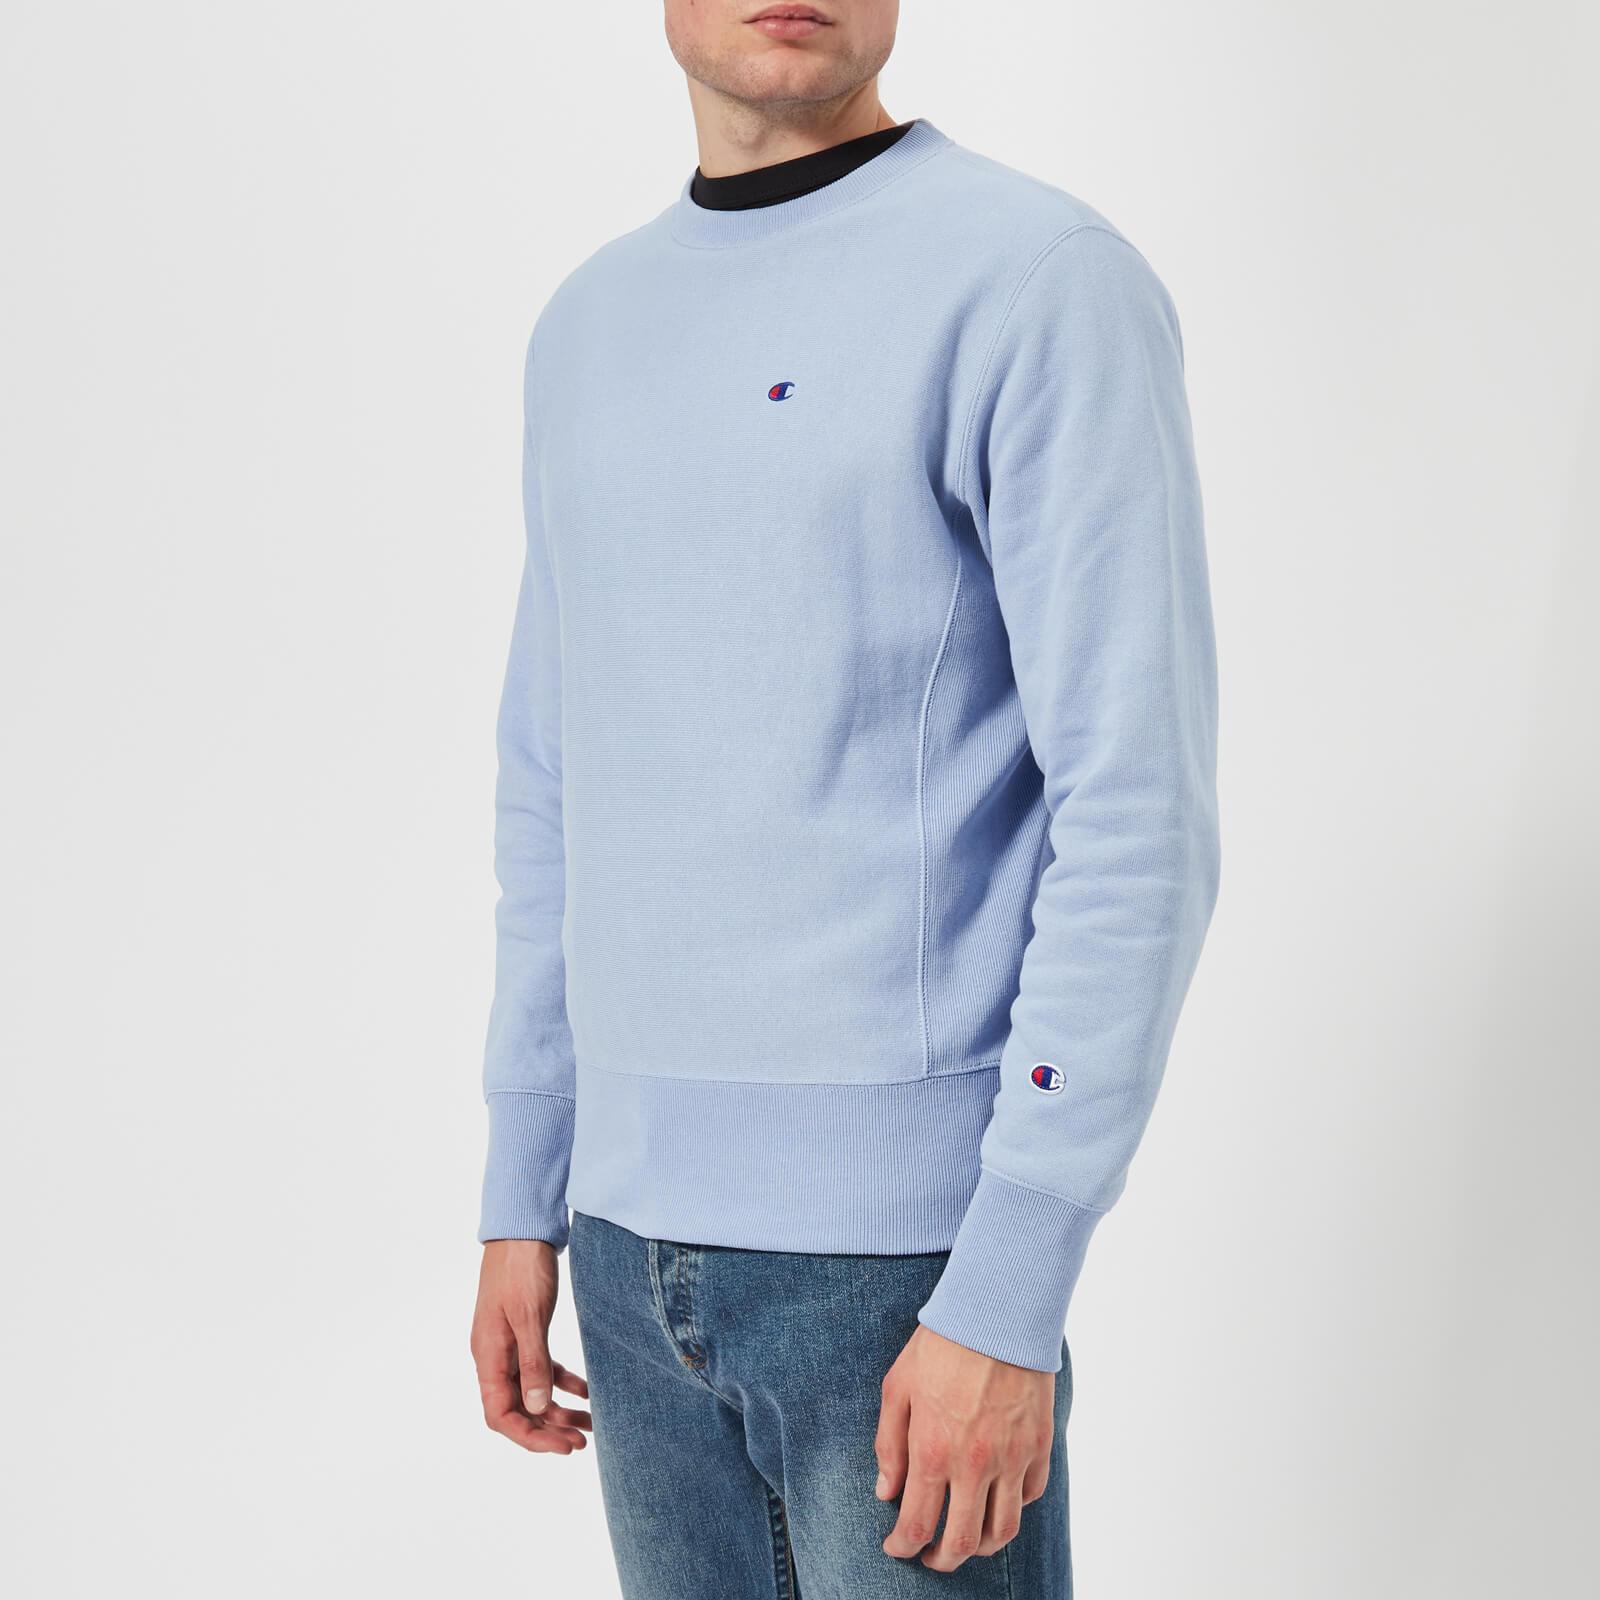 905d748160e8b0 Champion Men's Crew Neck Sweatshirt - Light Blue Mens Clothing | TheHut.com